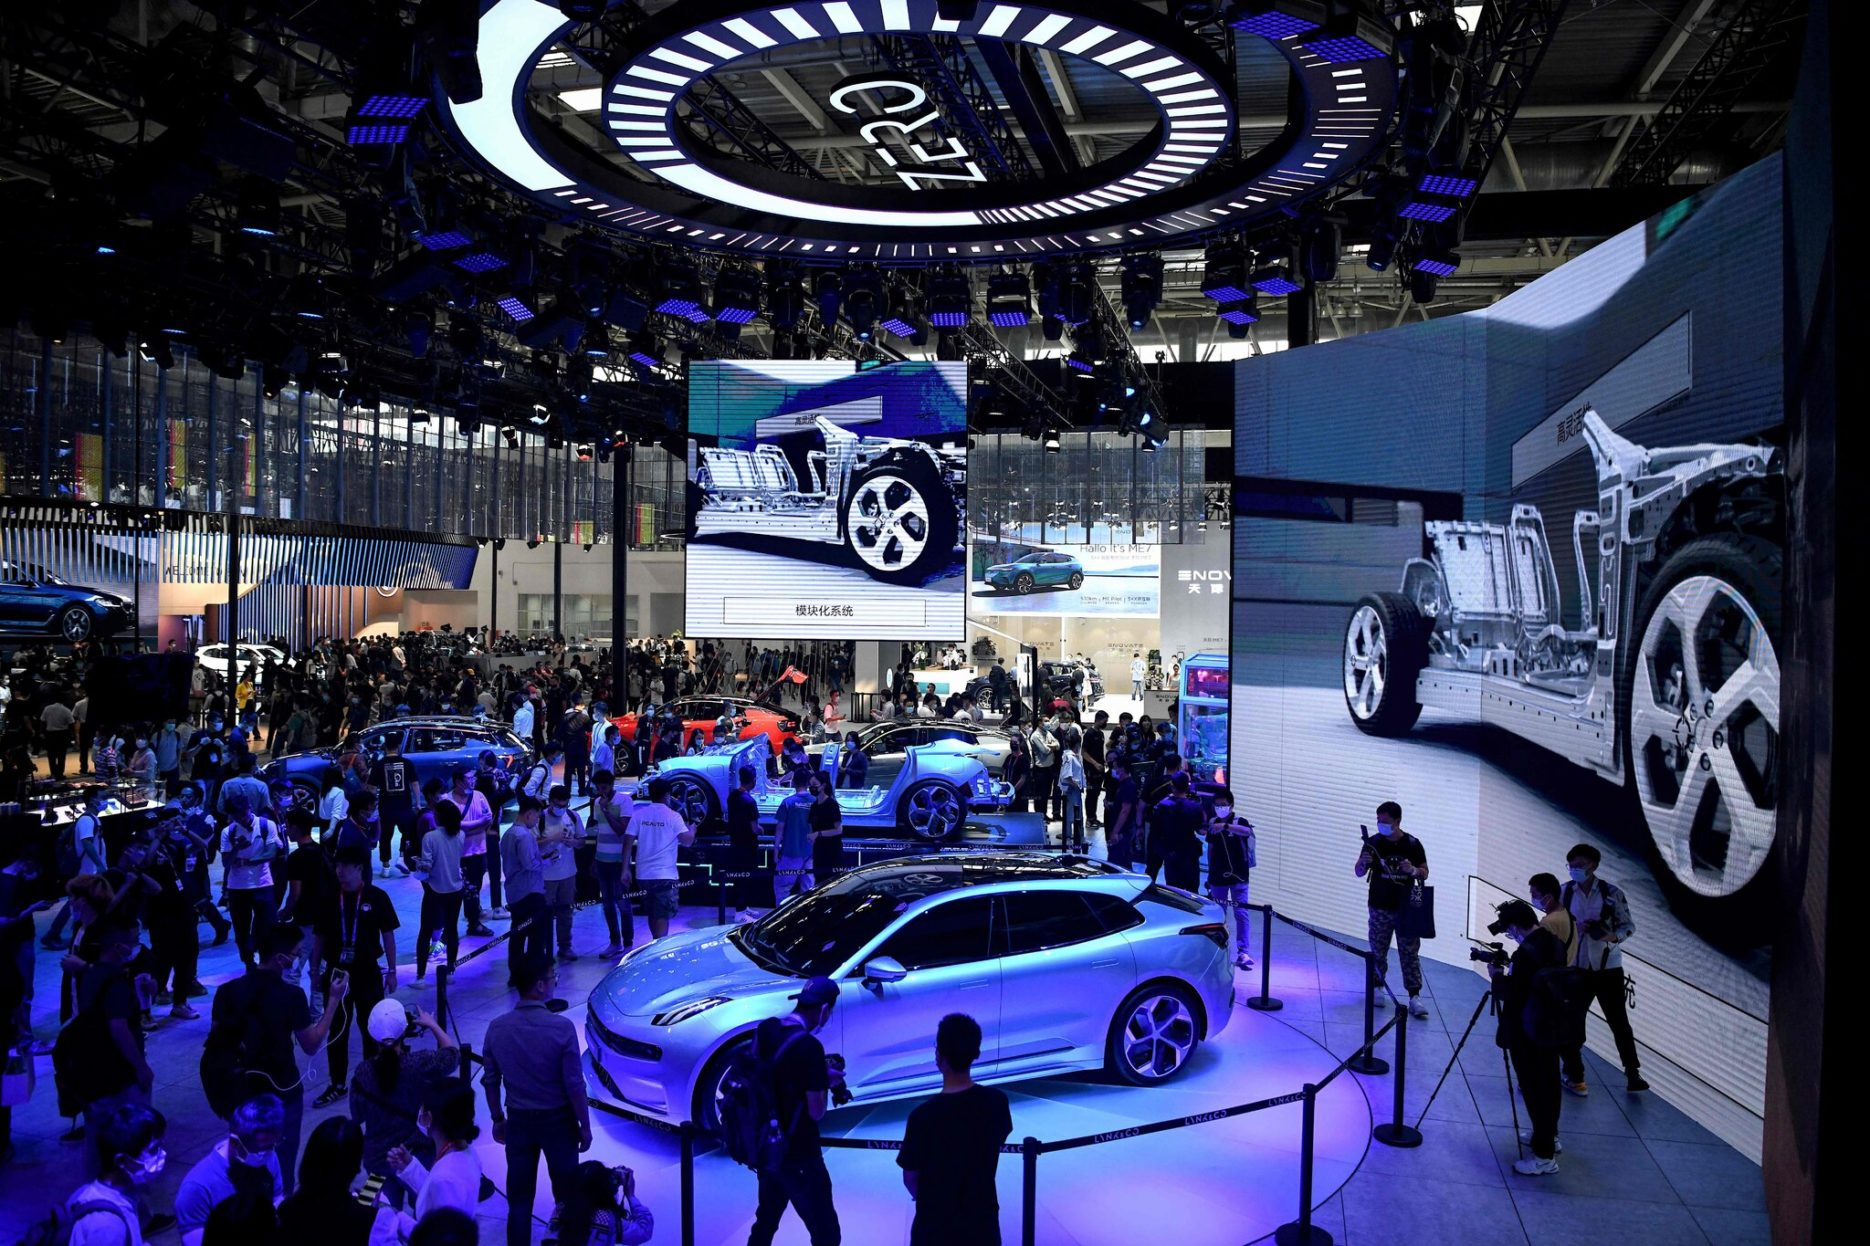 Beijing Auto car Show